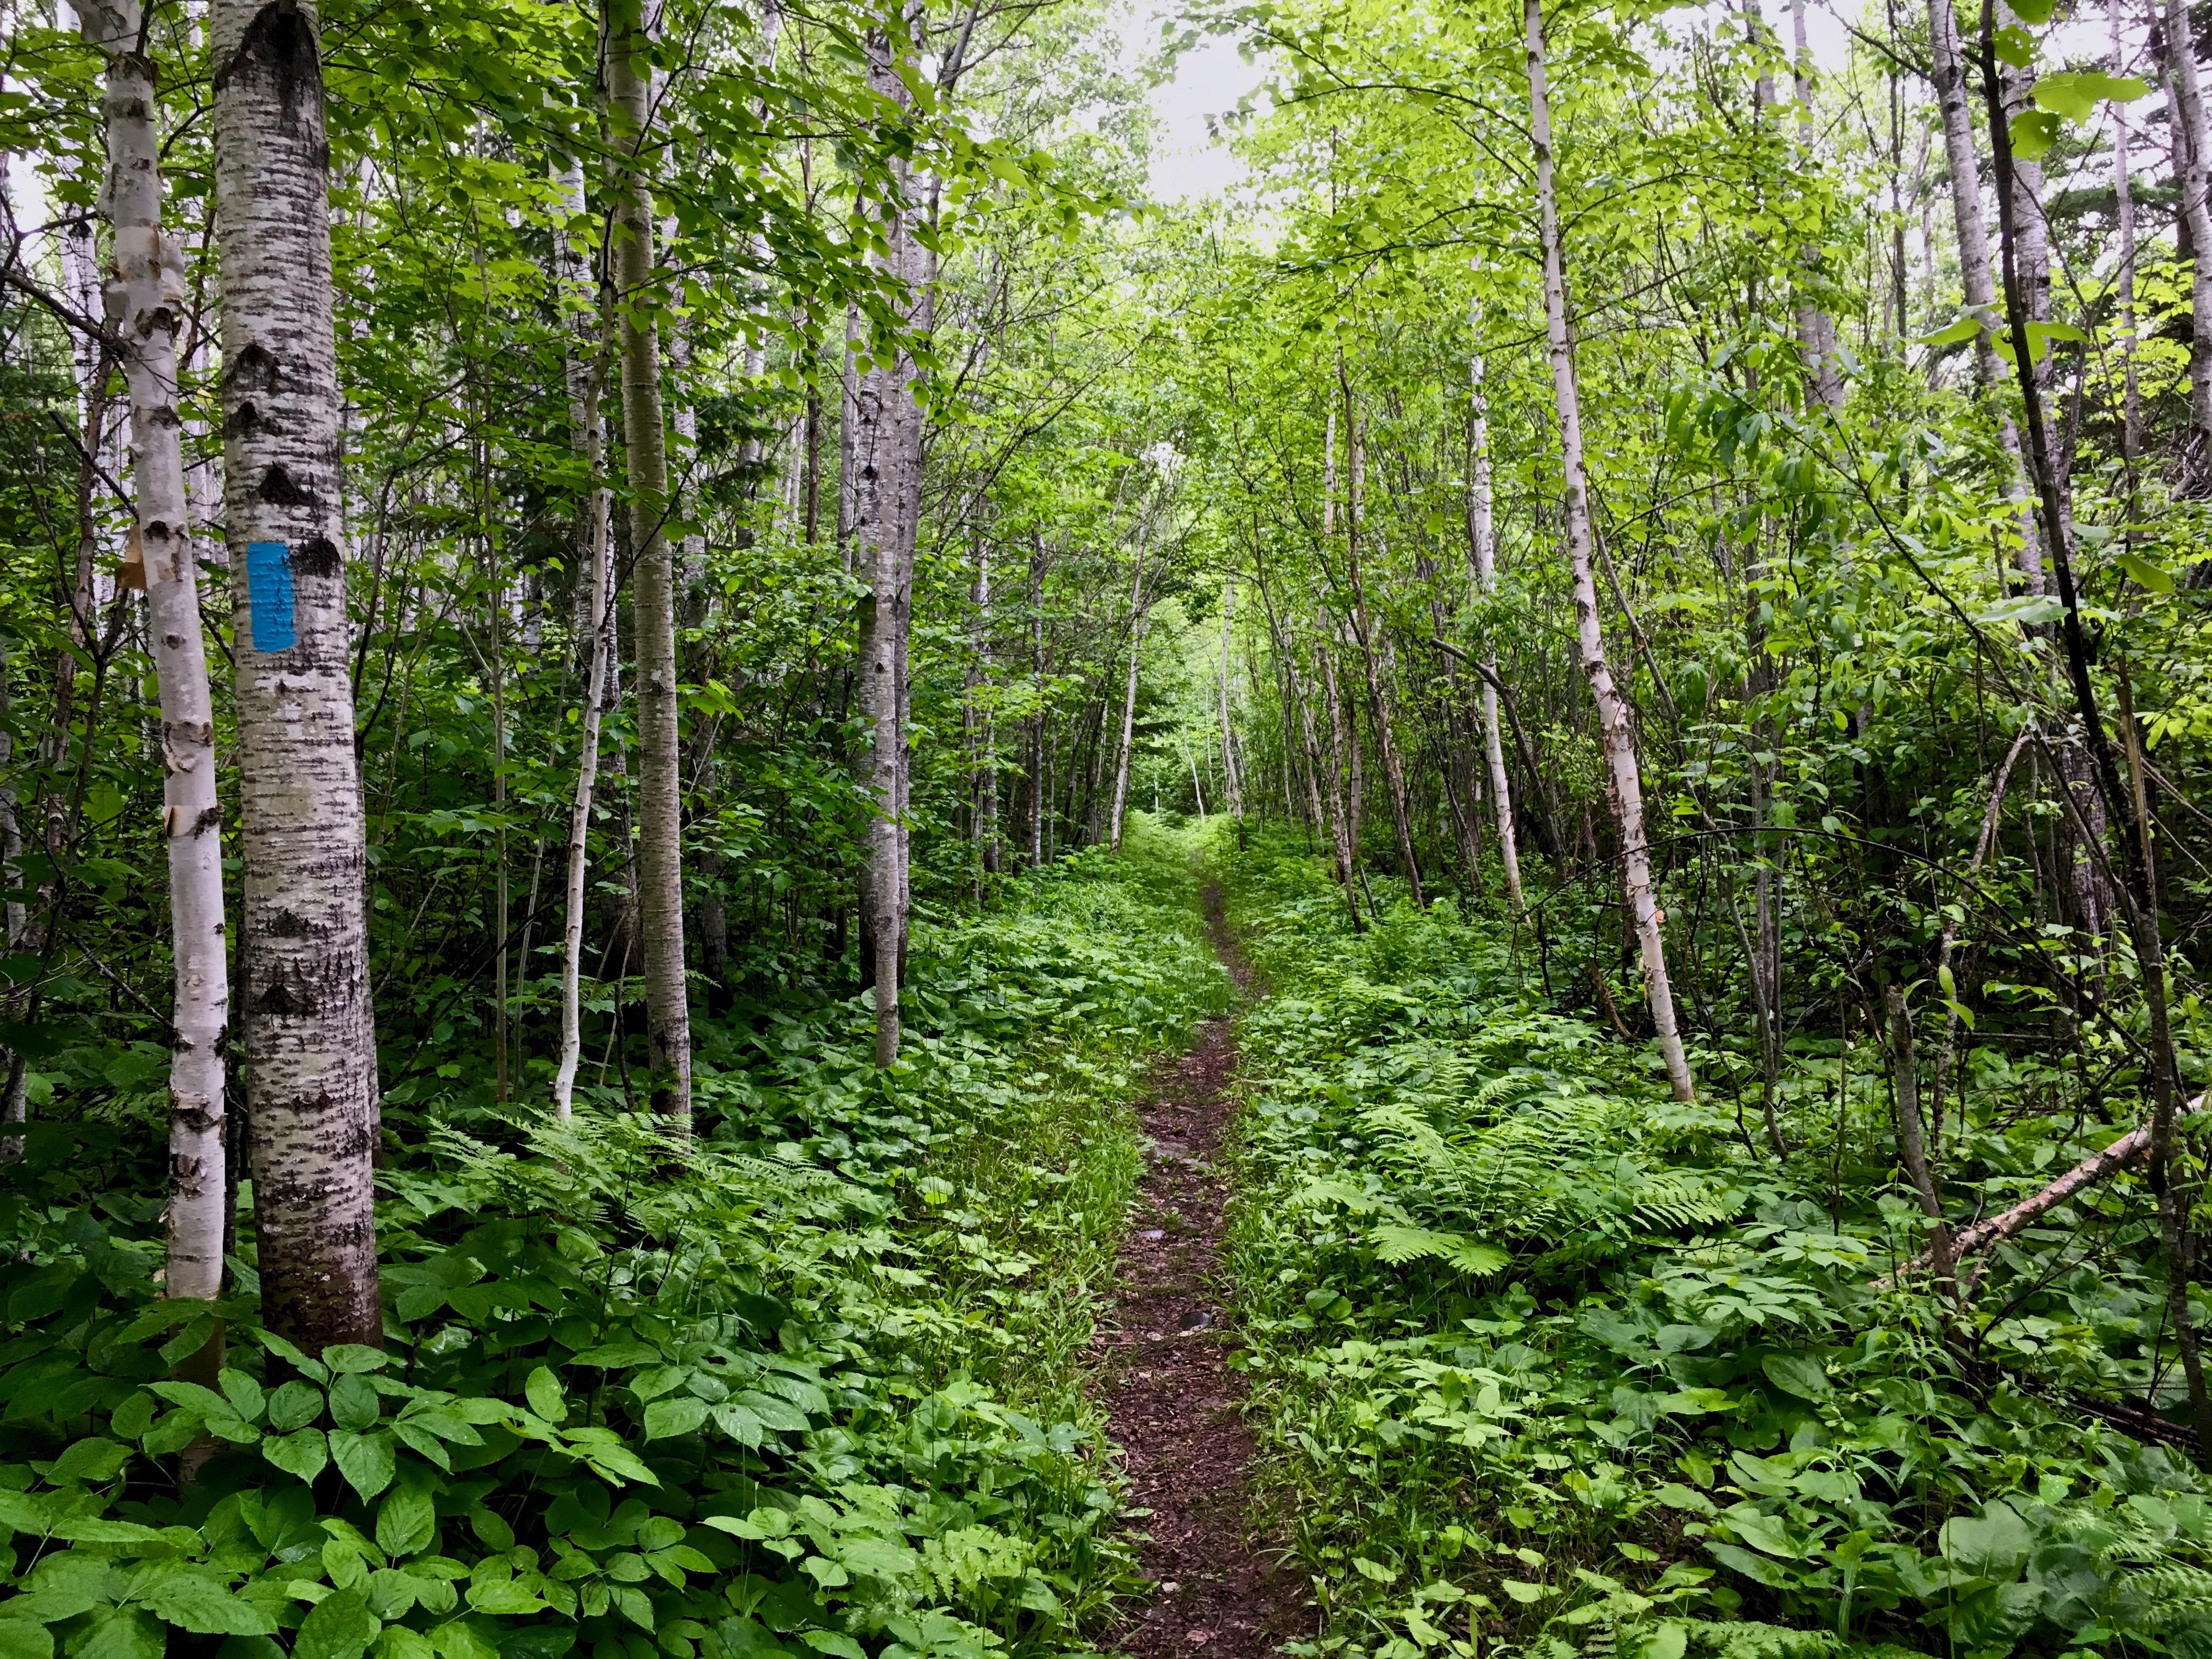 Superior Hiking Trail 34